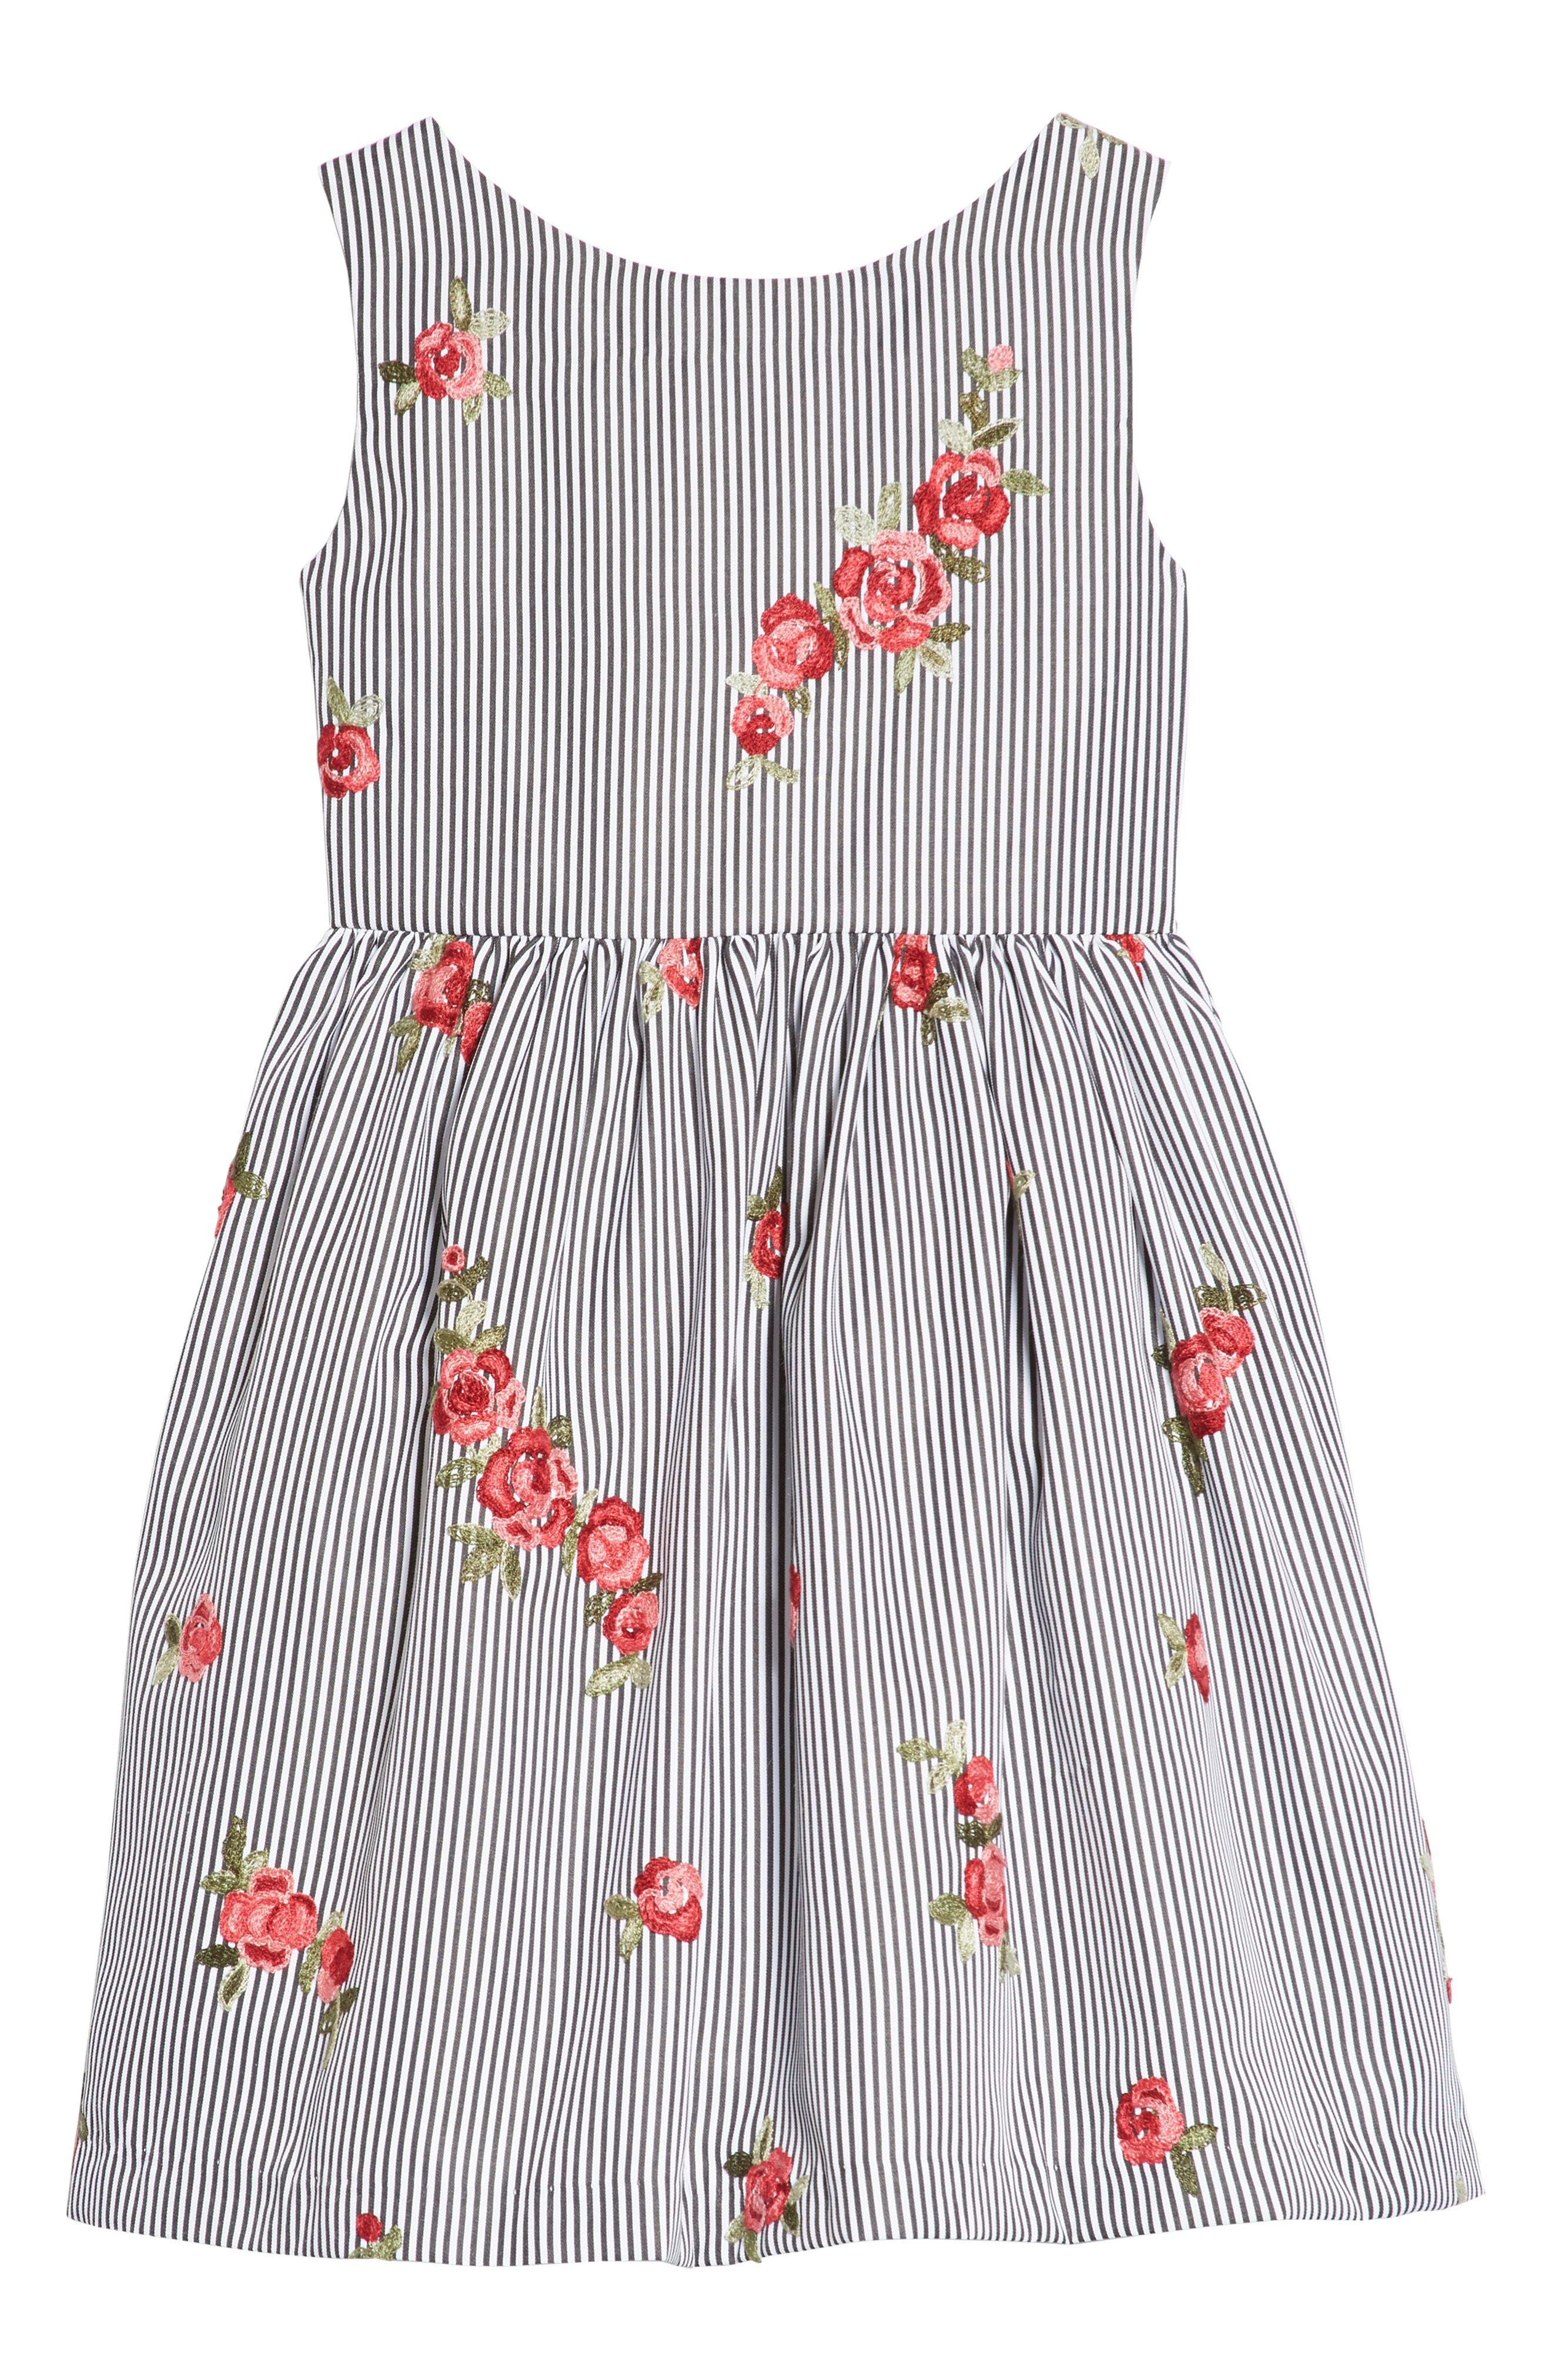 Embroidered Stripe Dress,                             Main thumbnail 1, color,                             Black/ White